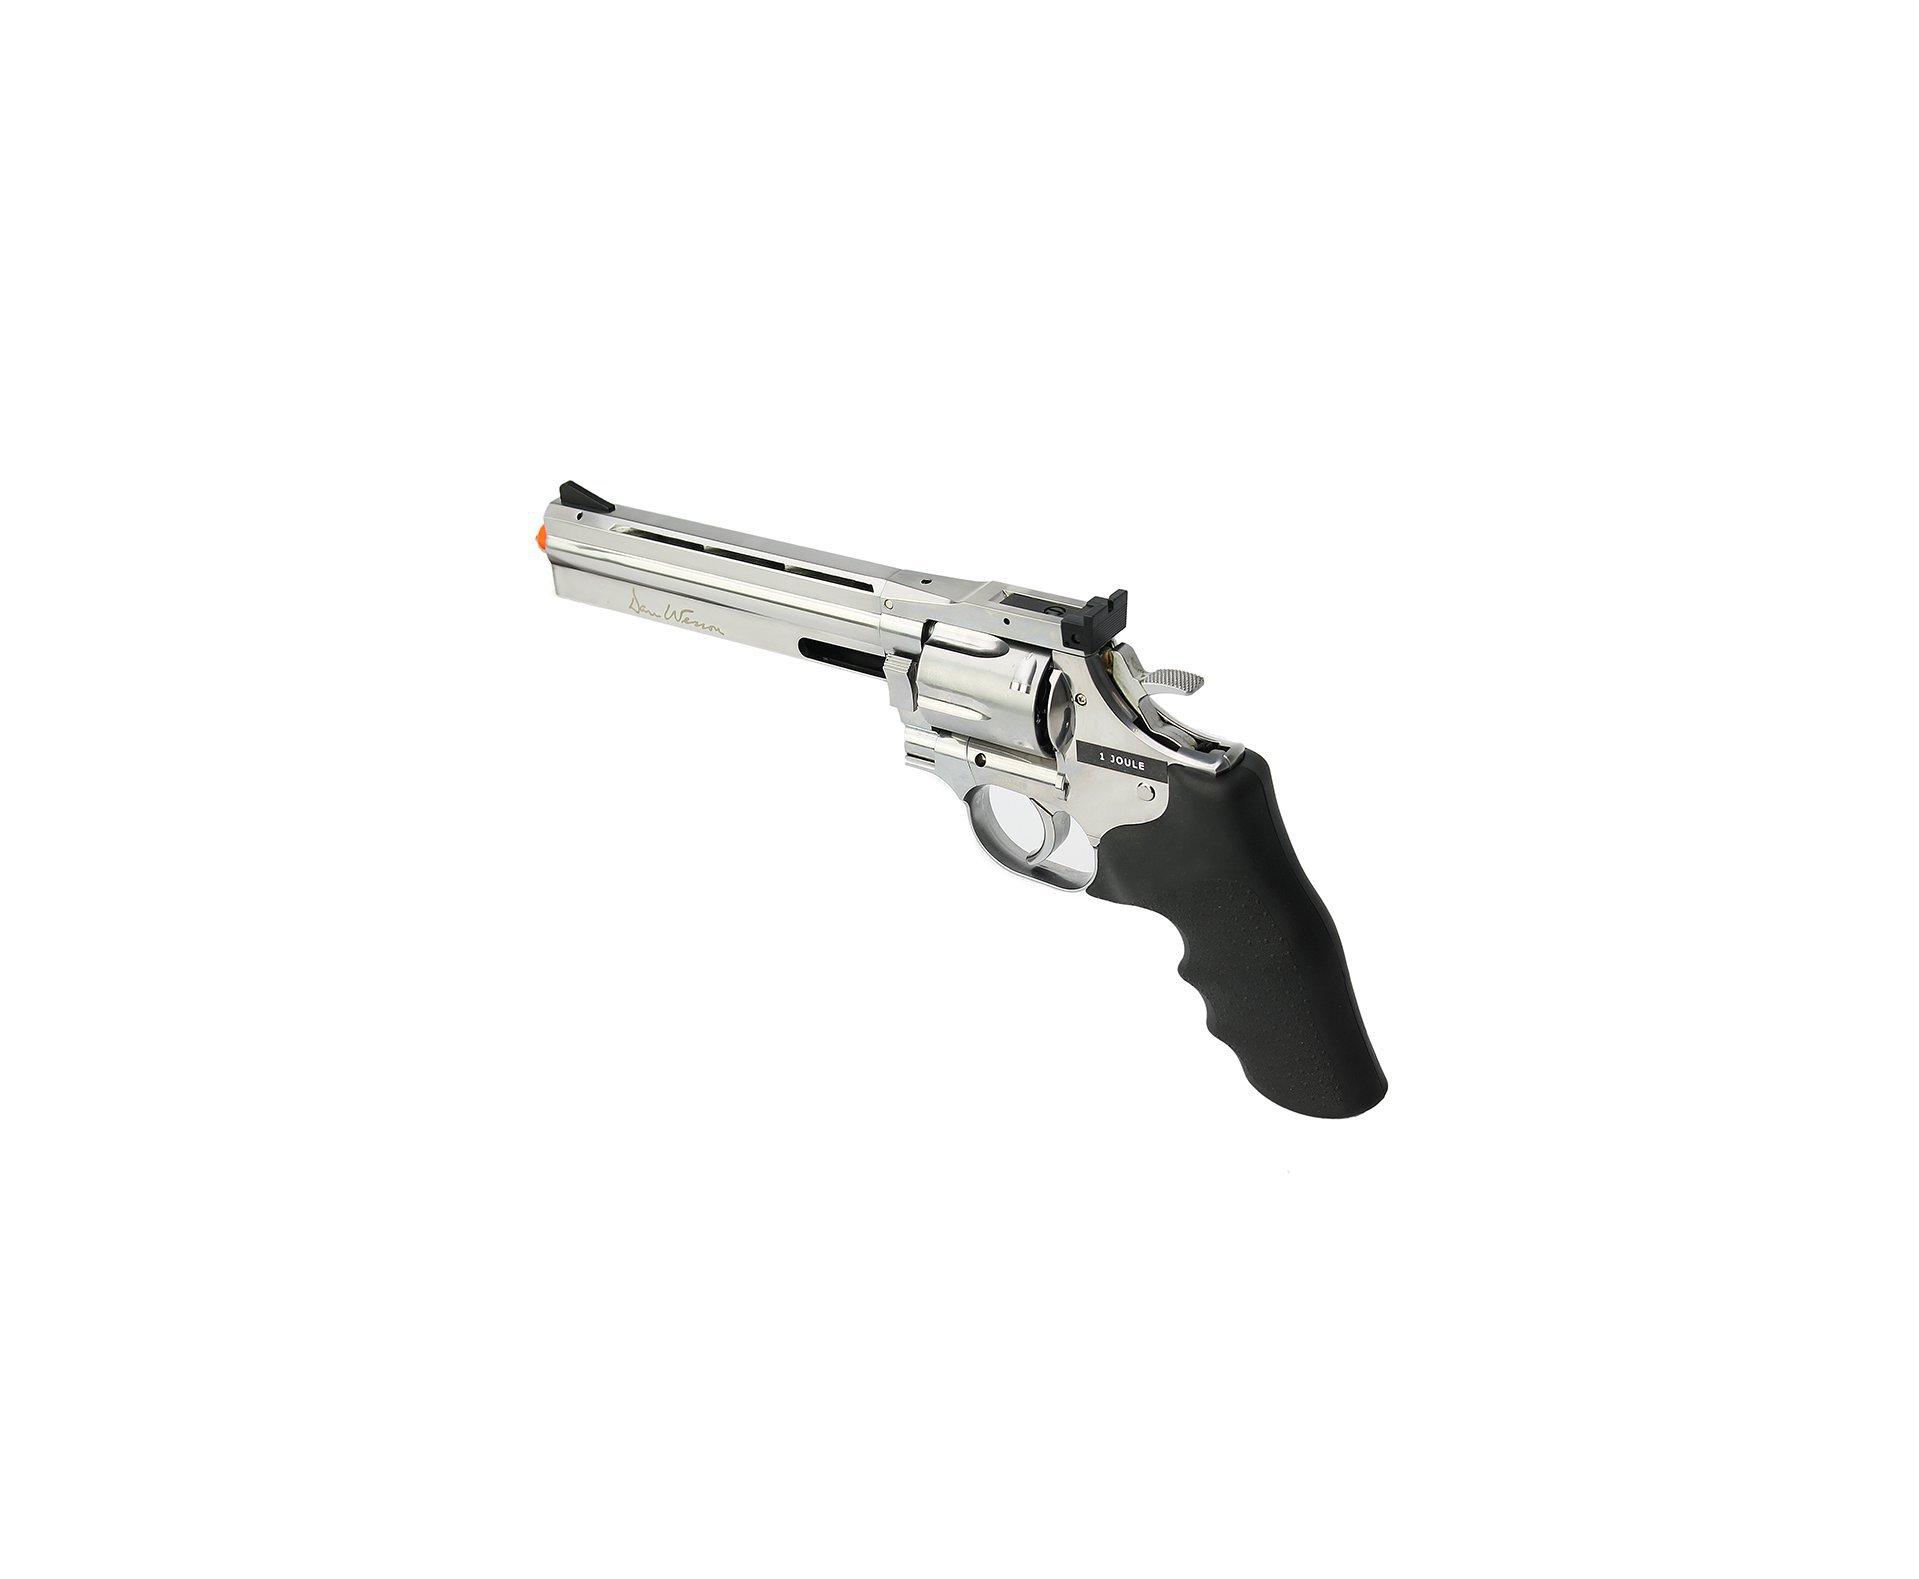 "Revolver De Airsoft Co2 Full Metal Dan Weson 715 6"" Inox Low Power Silver 6,0mm Asg"